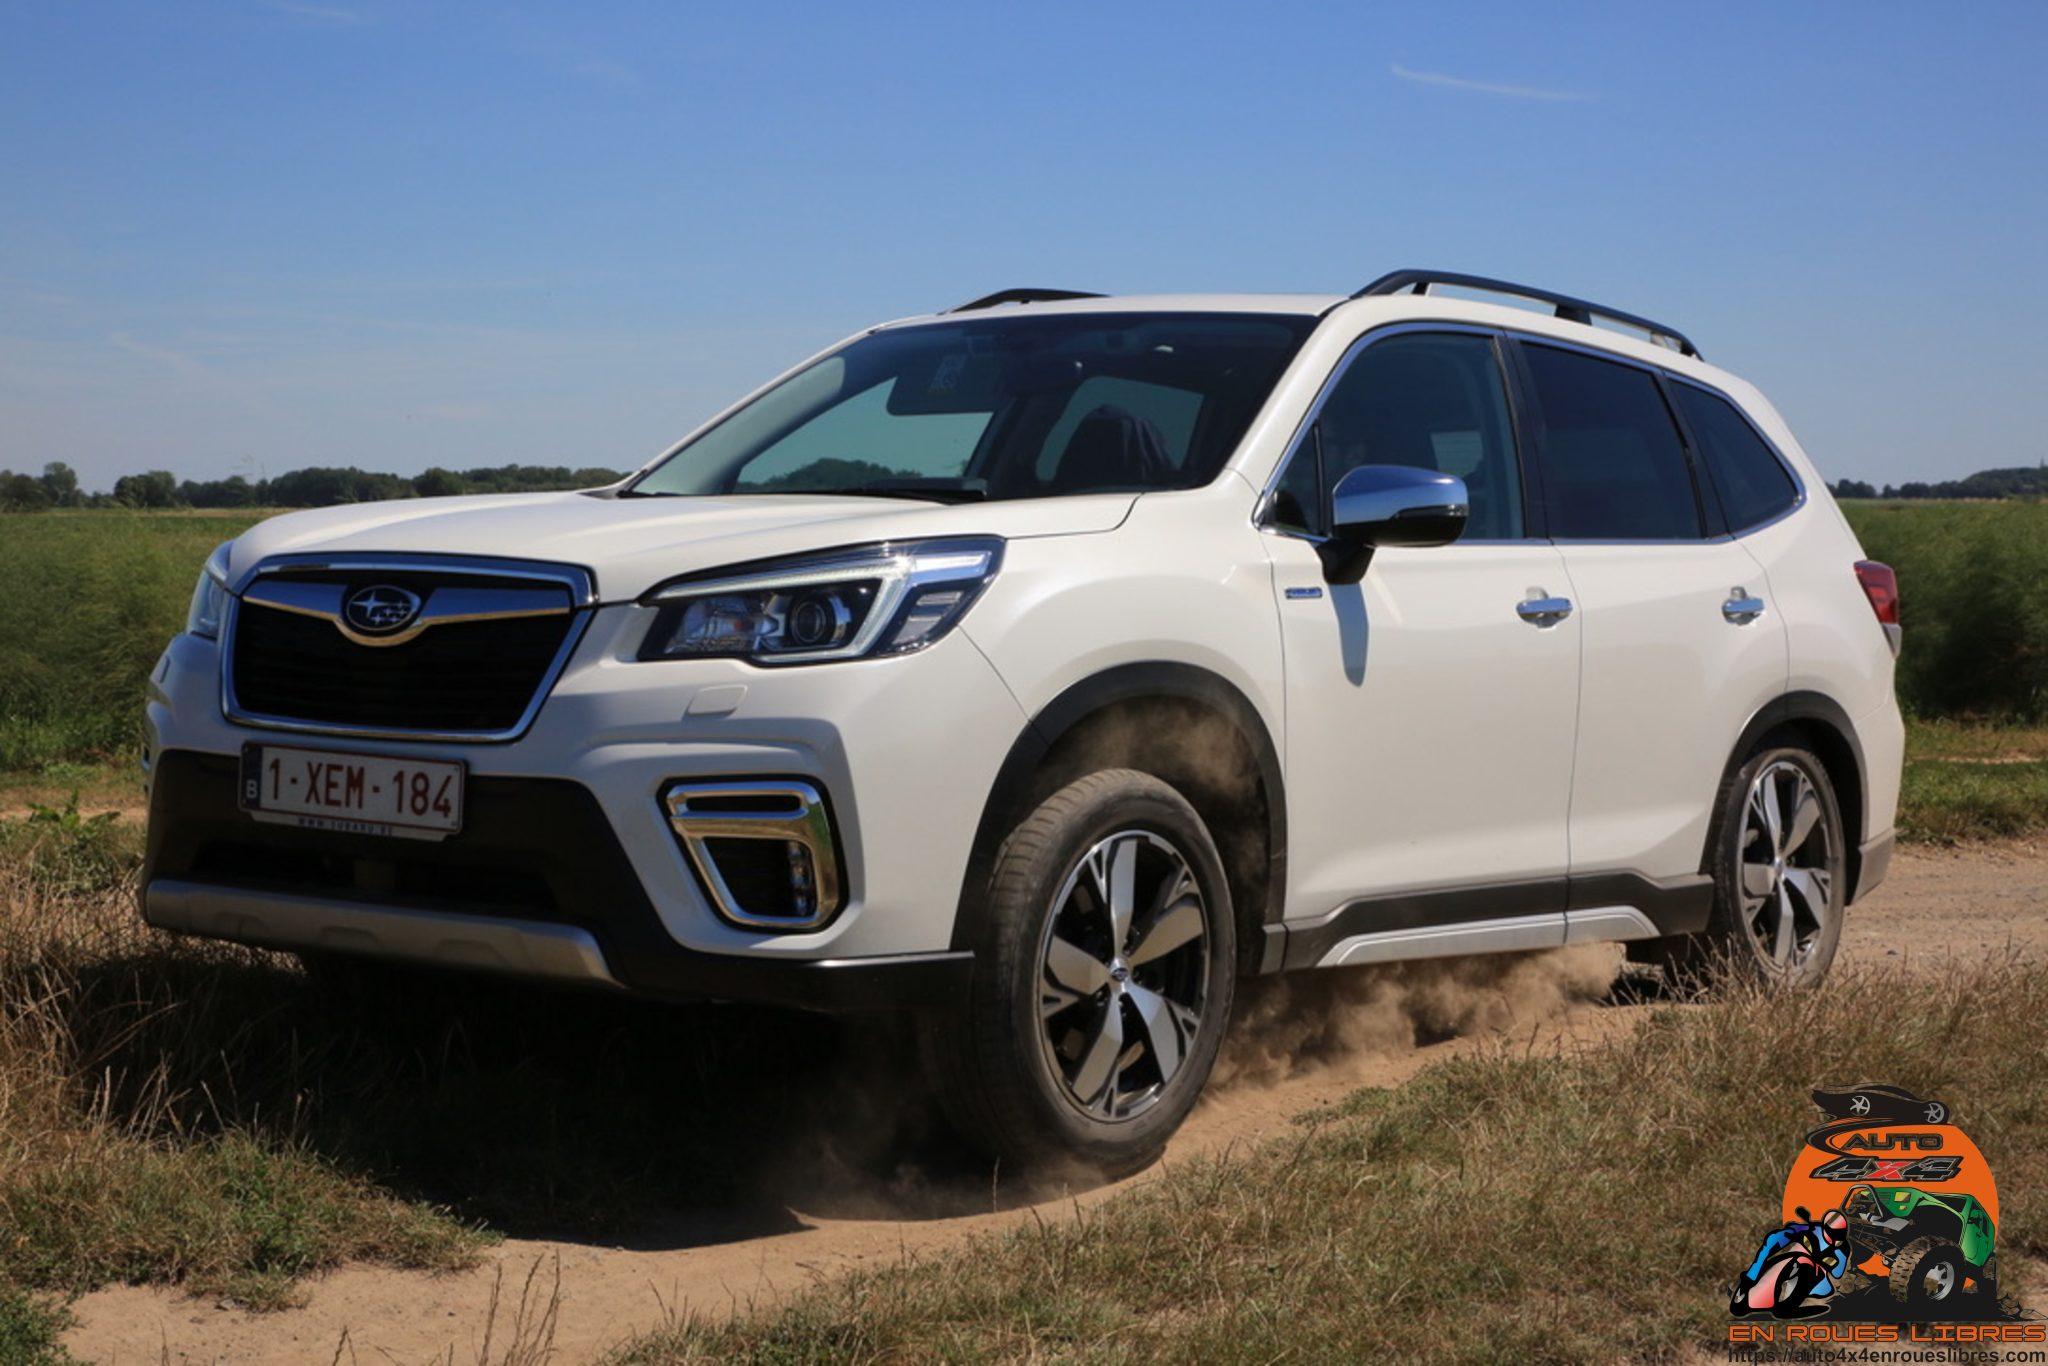 Le Subaru Forester 2.0i e Boxer, un suv hybride familial mais pas que !